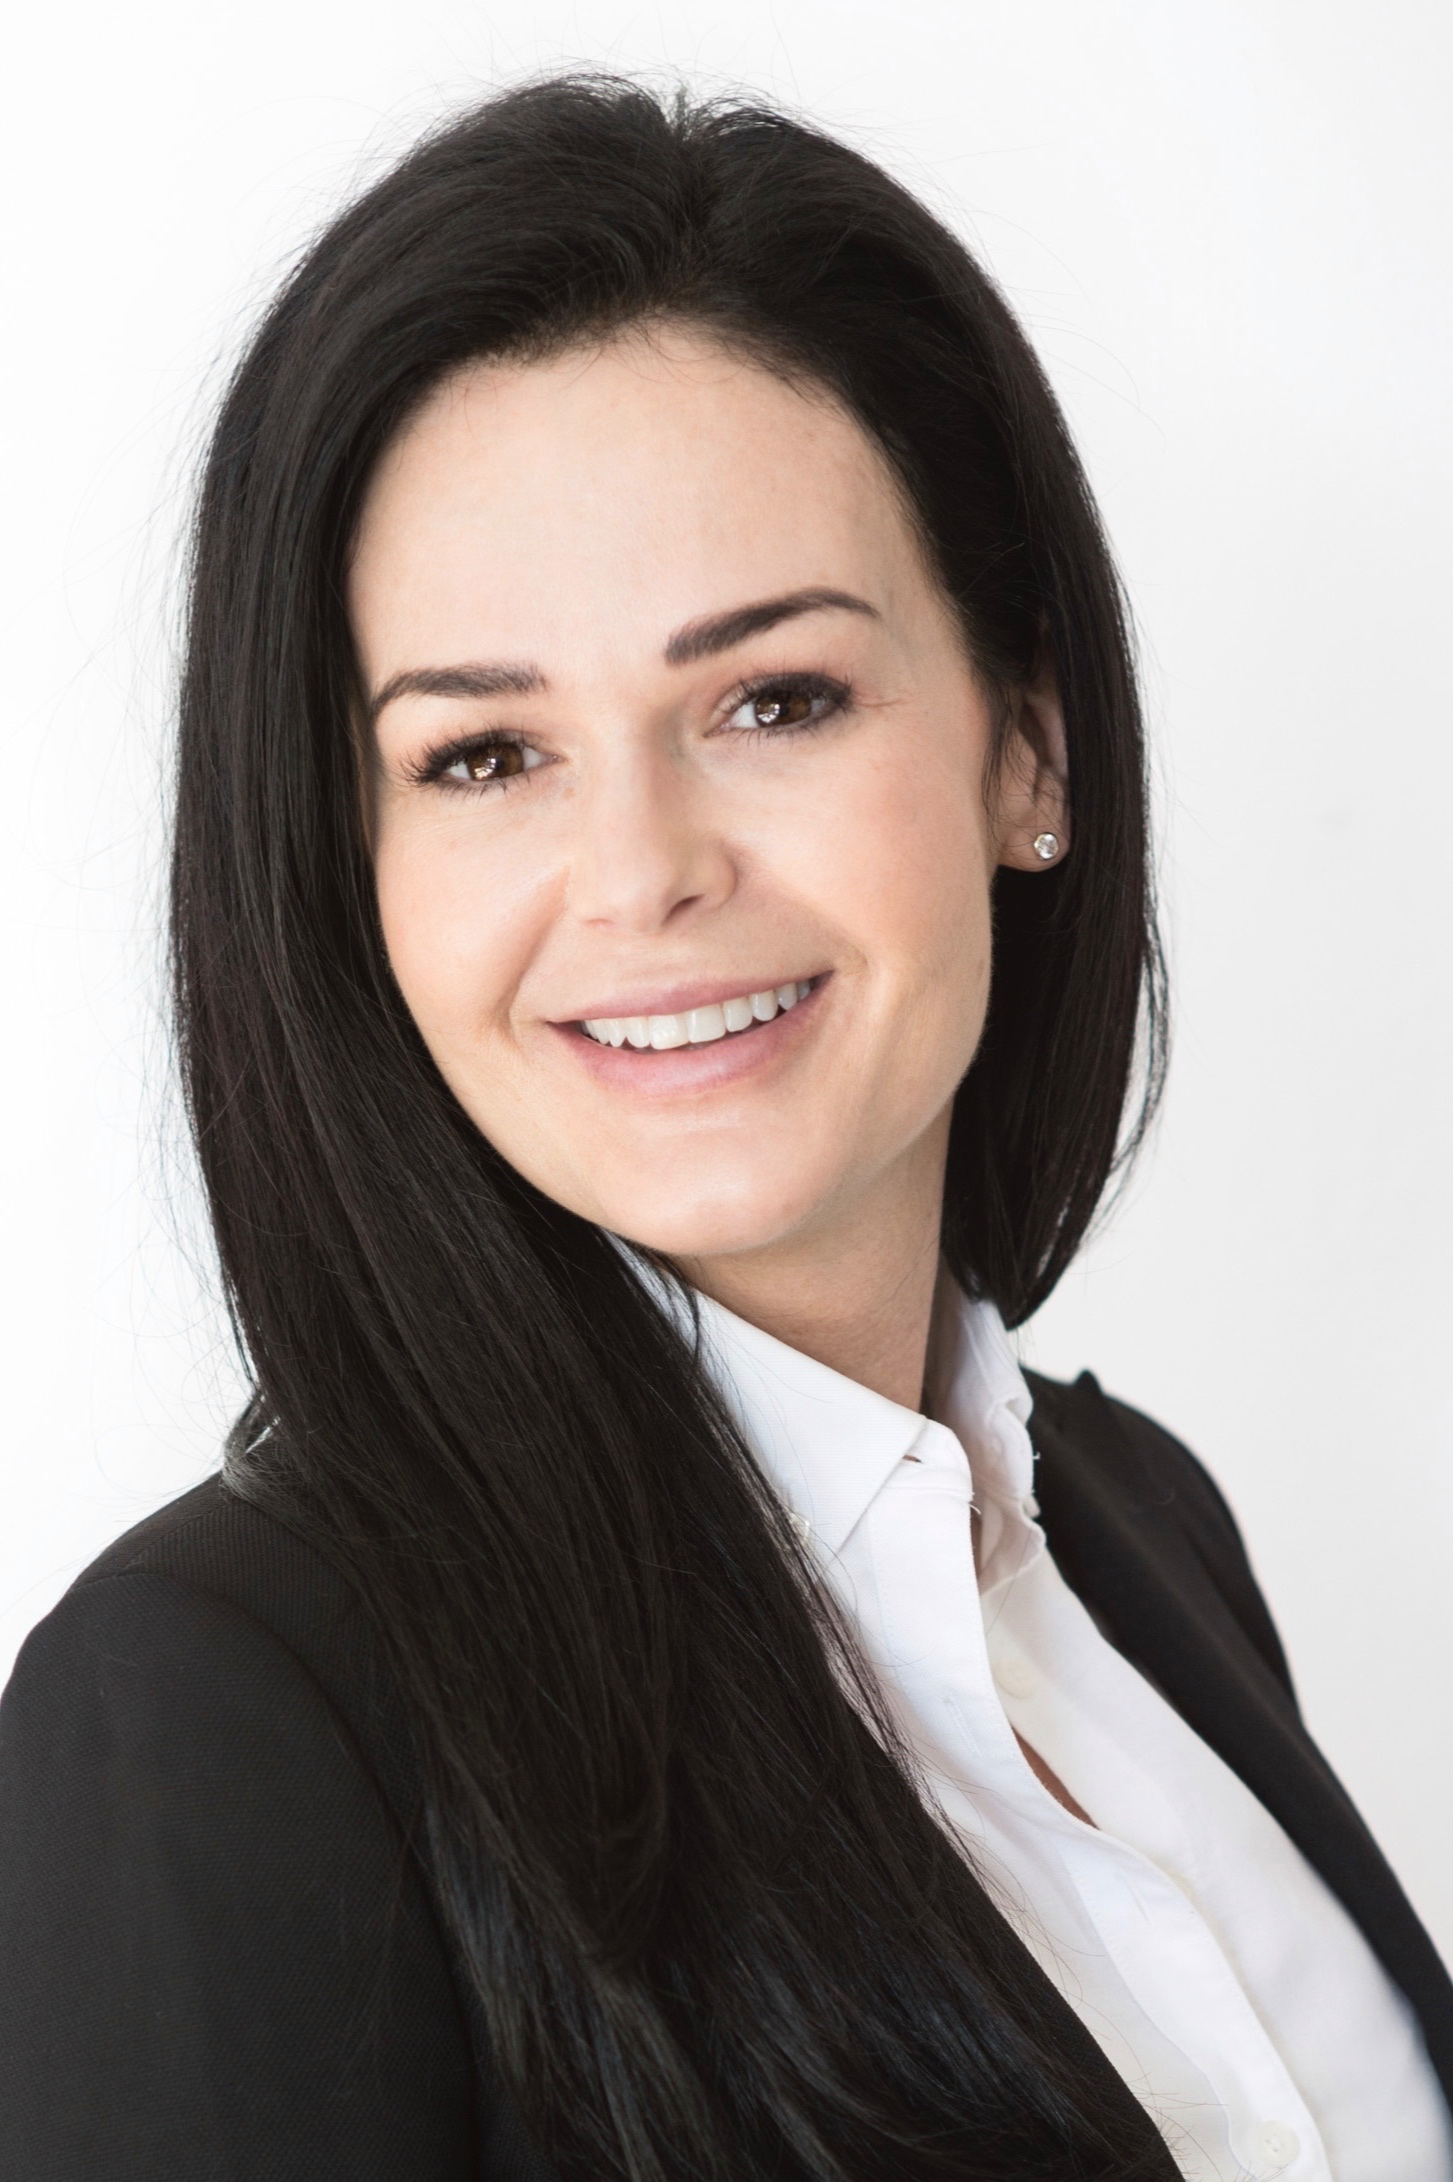 Monica McCracken - Managing Partner